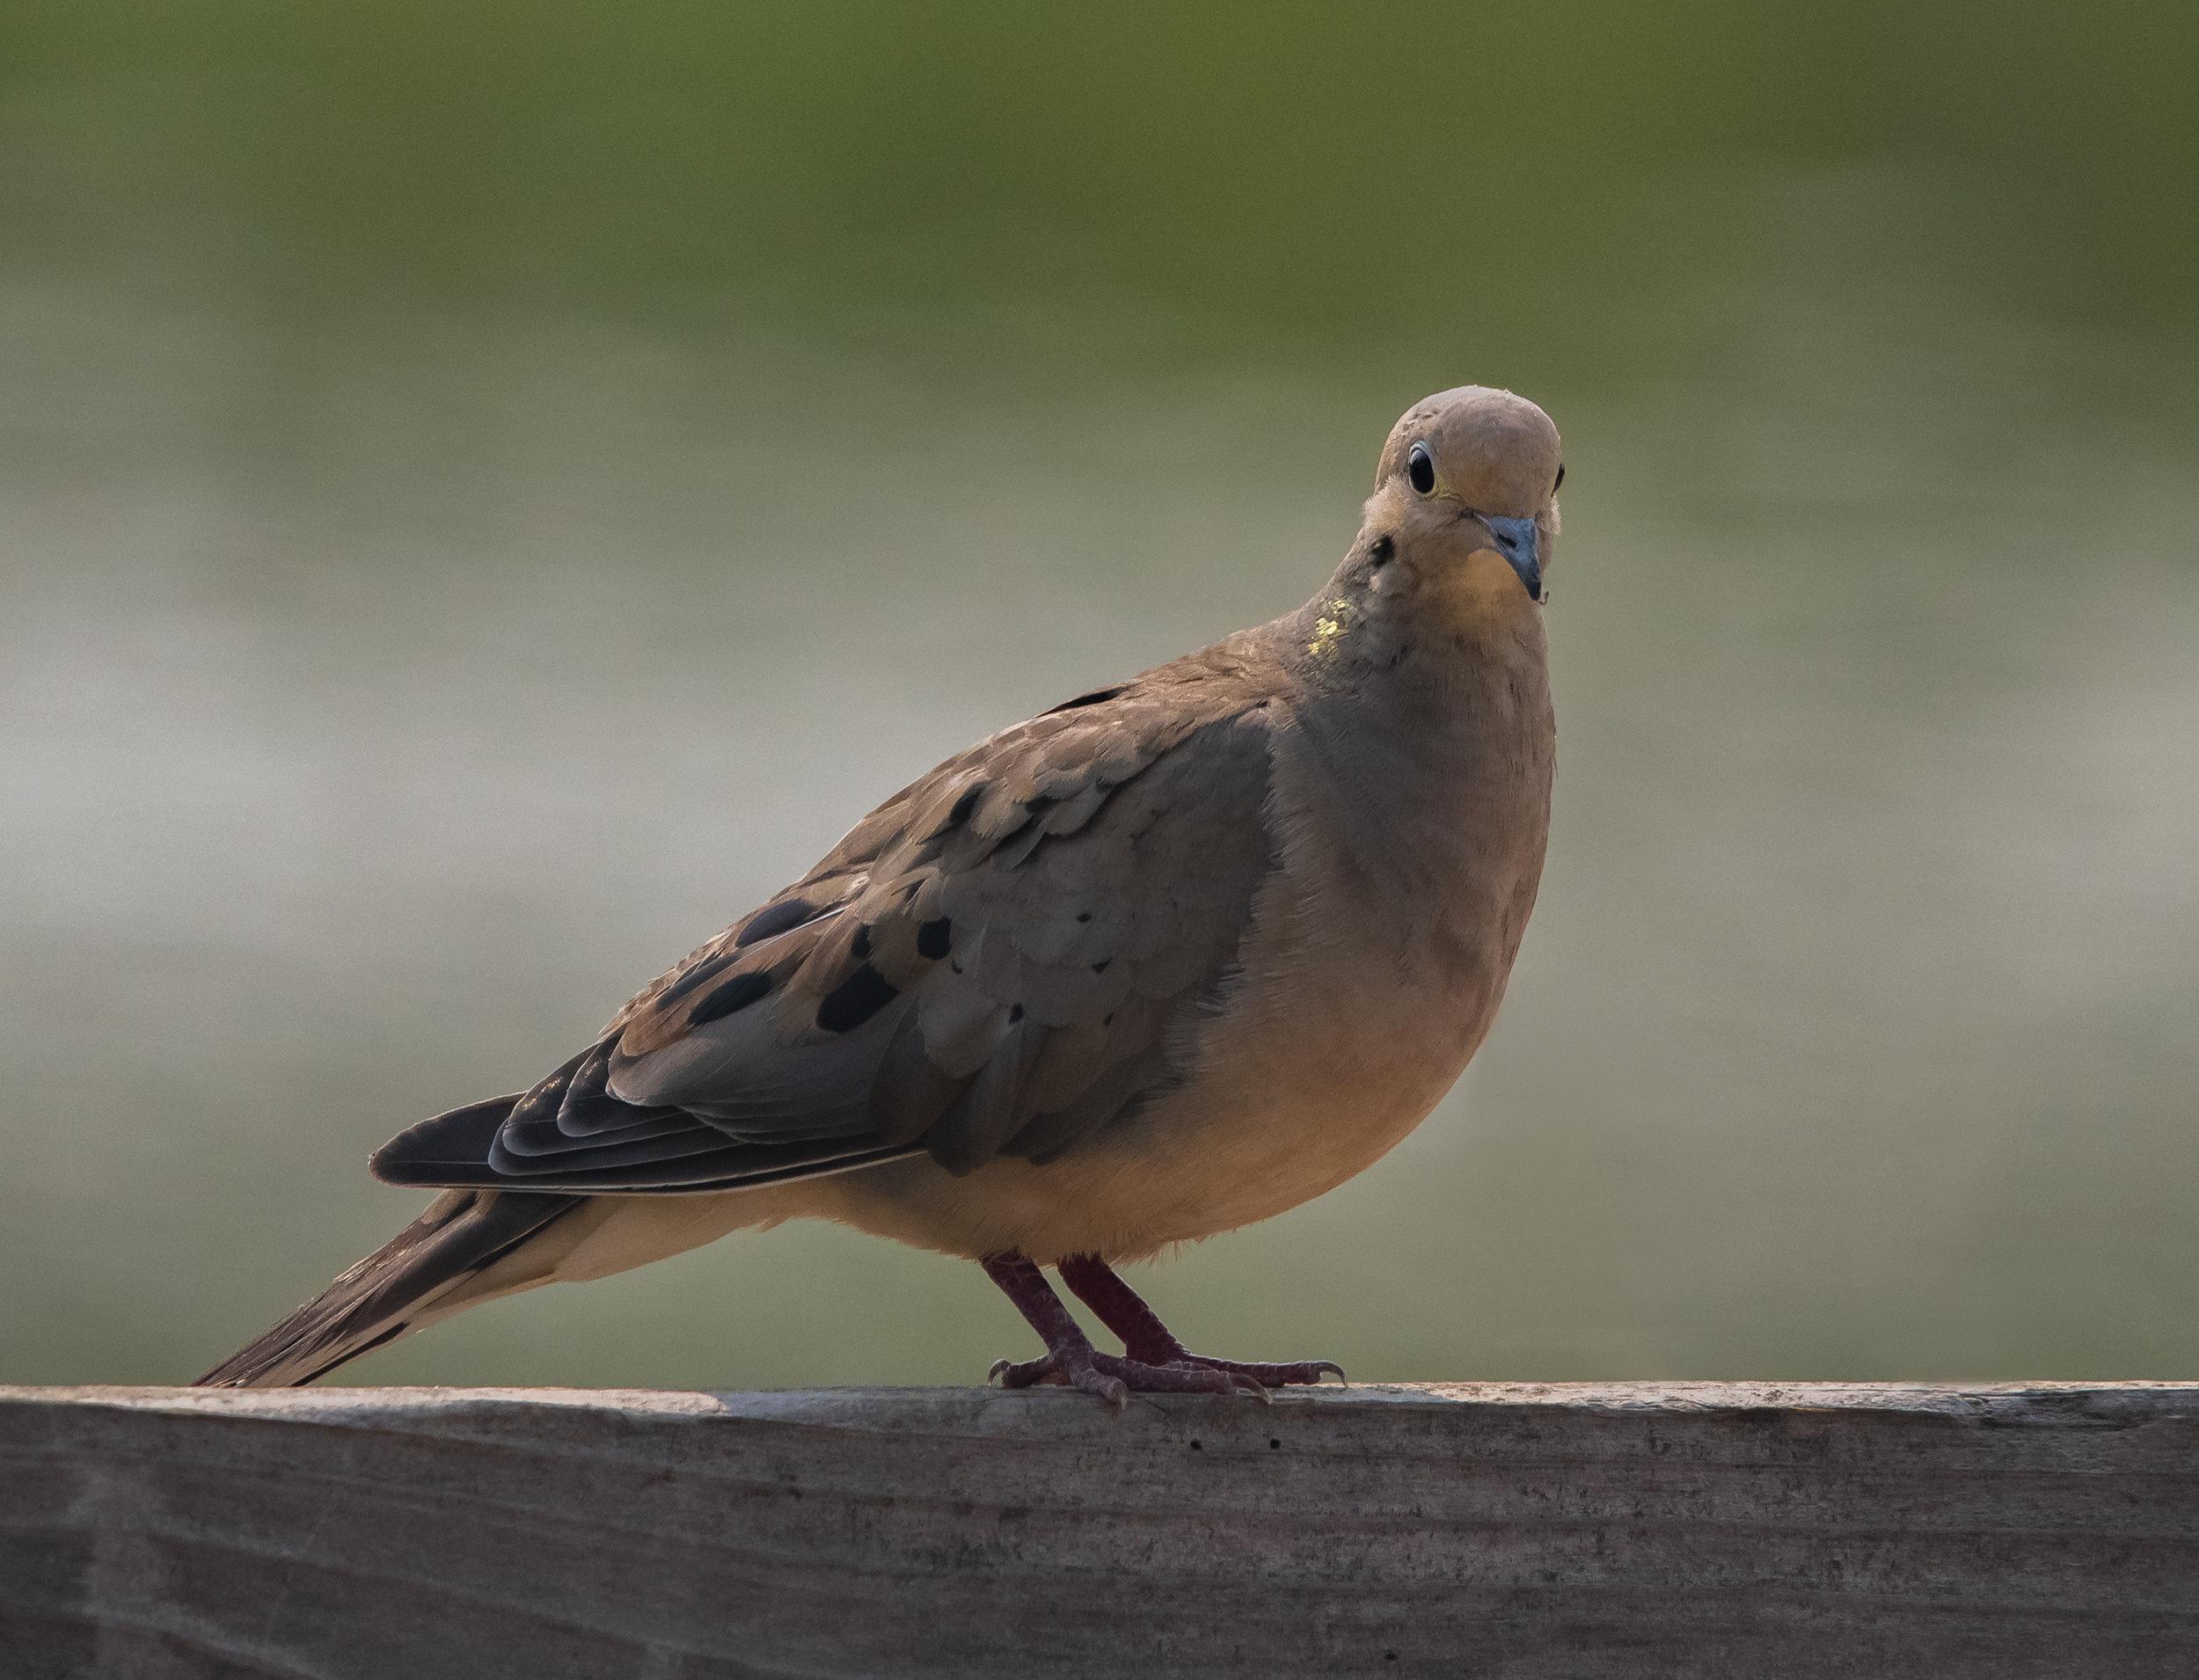 Mourning Dove at Almaden Lake Park, San Jose, California